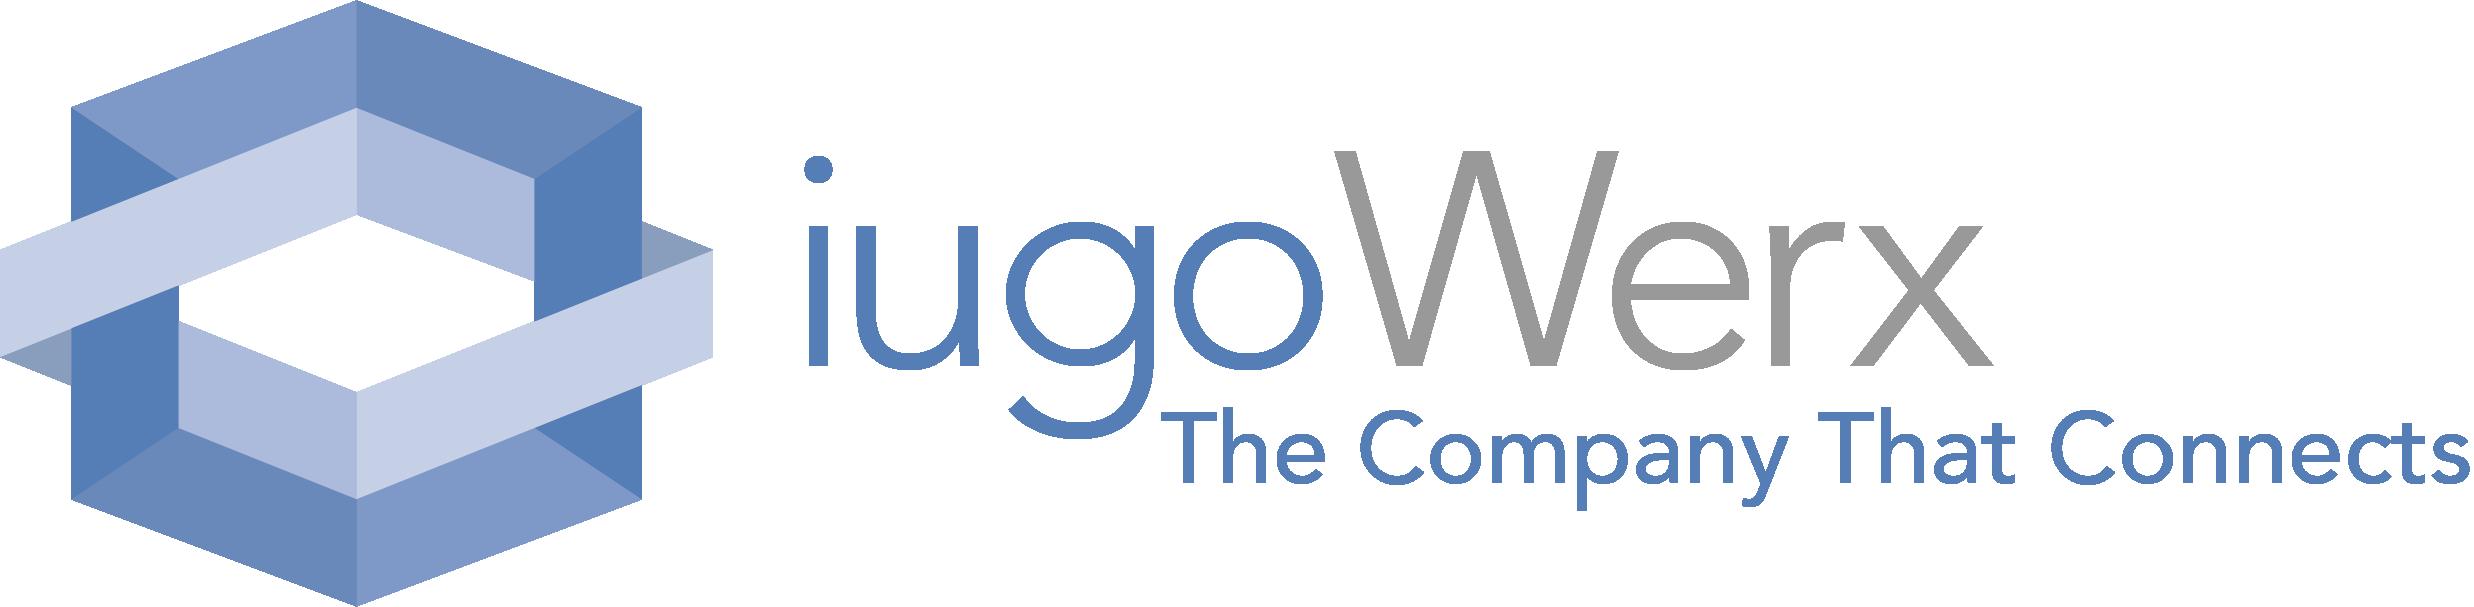 iugoWerx Inc.